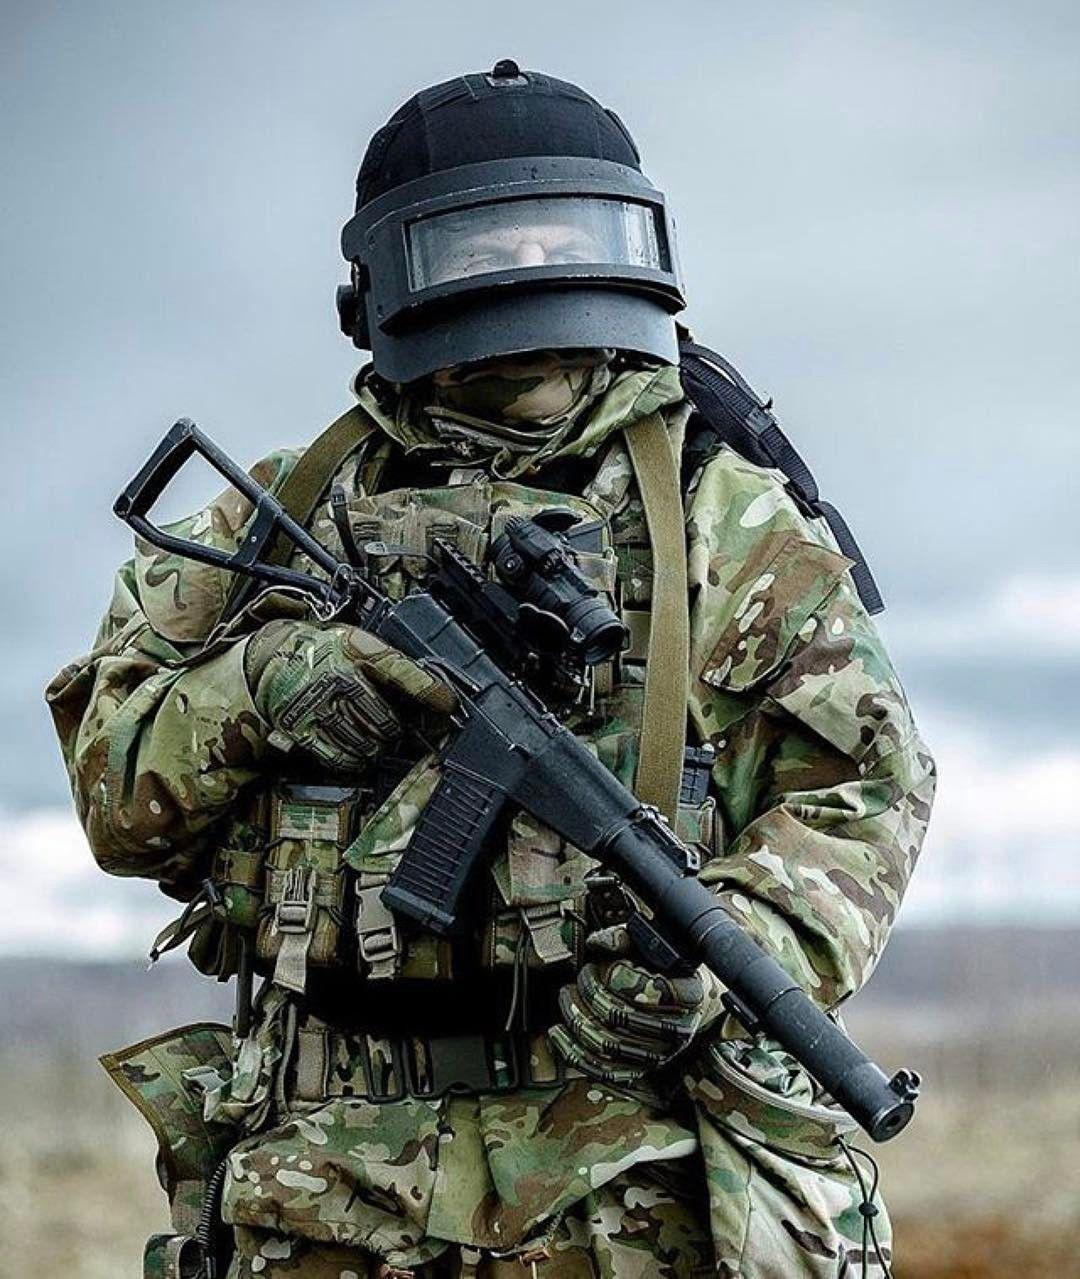 Russian Spetsnaz Photo Russiansoldier001: #Repost @spetsnaz.alfa ・・・ Spetsnaz SOBR Operator